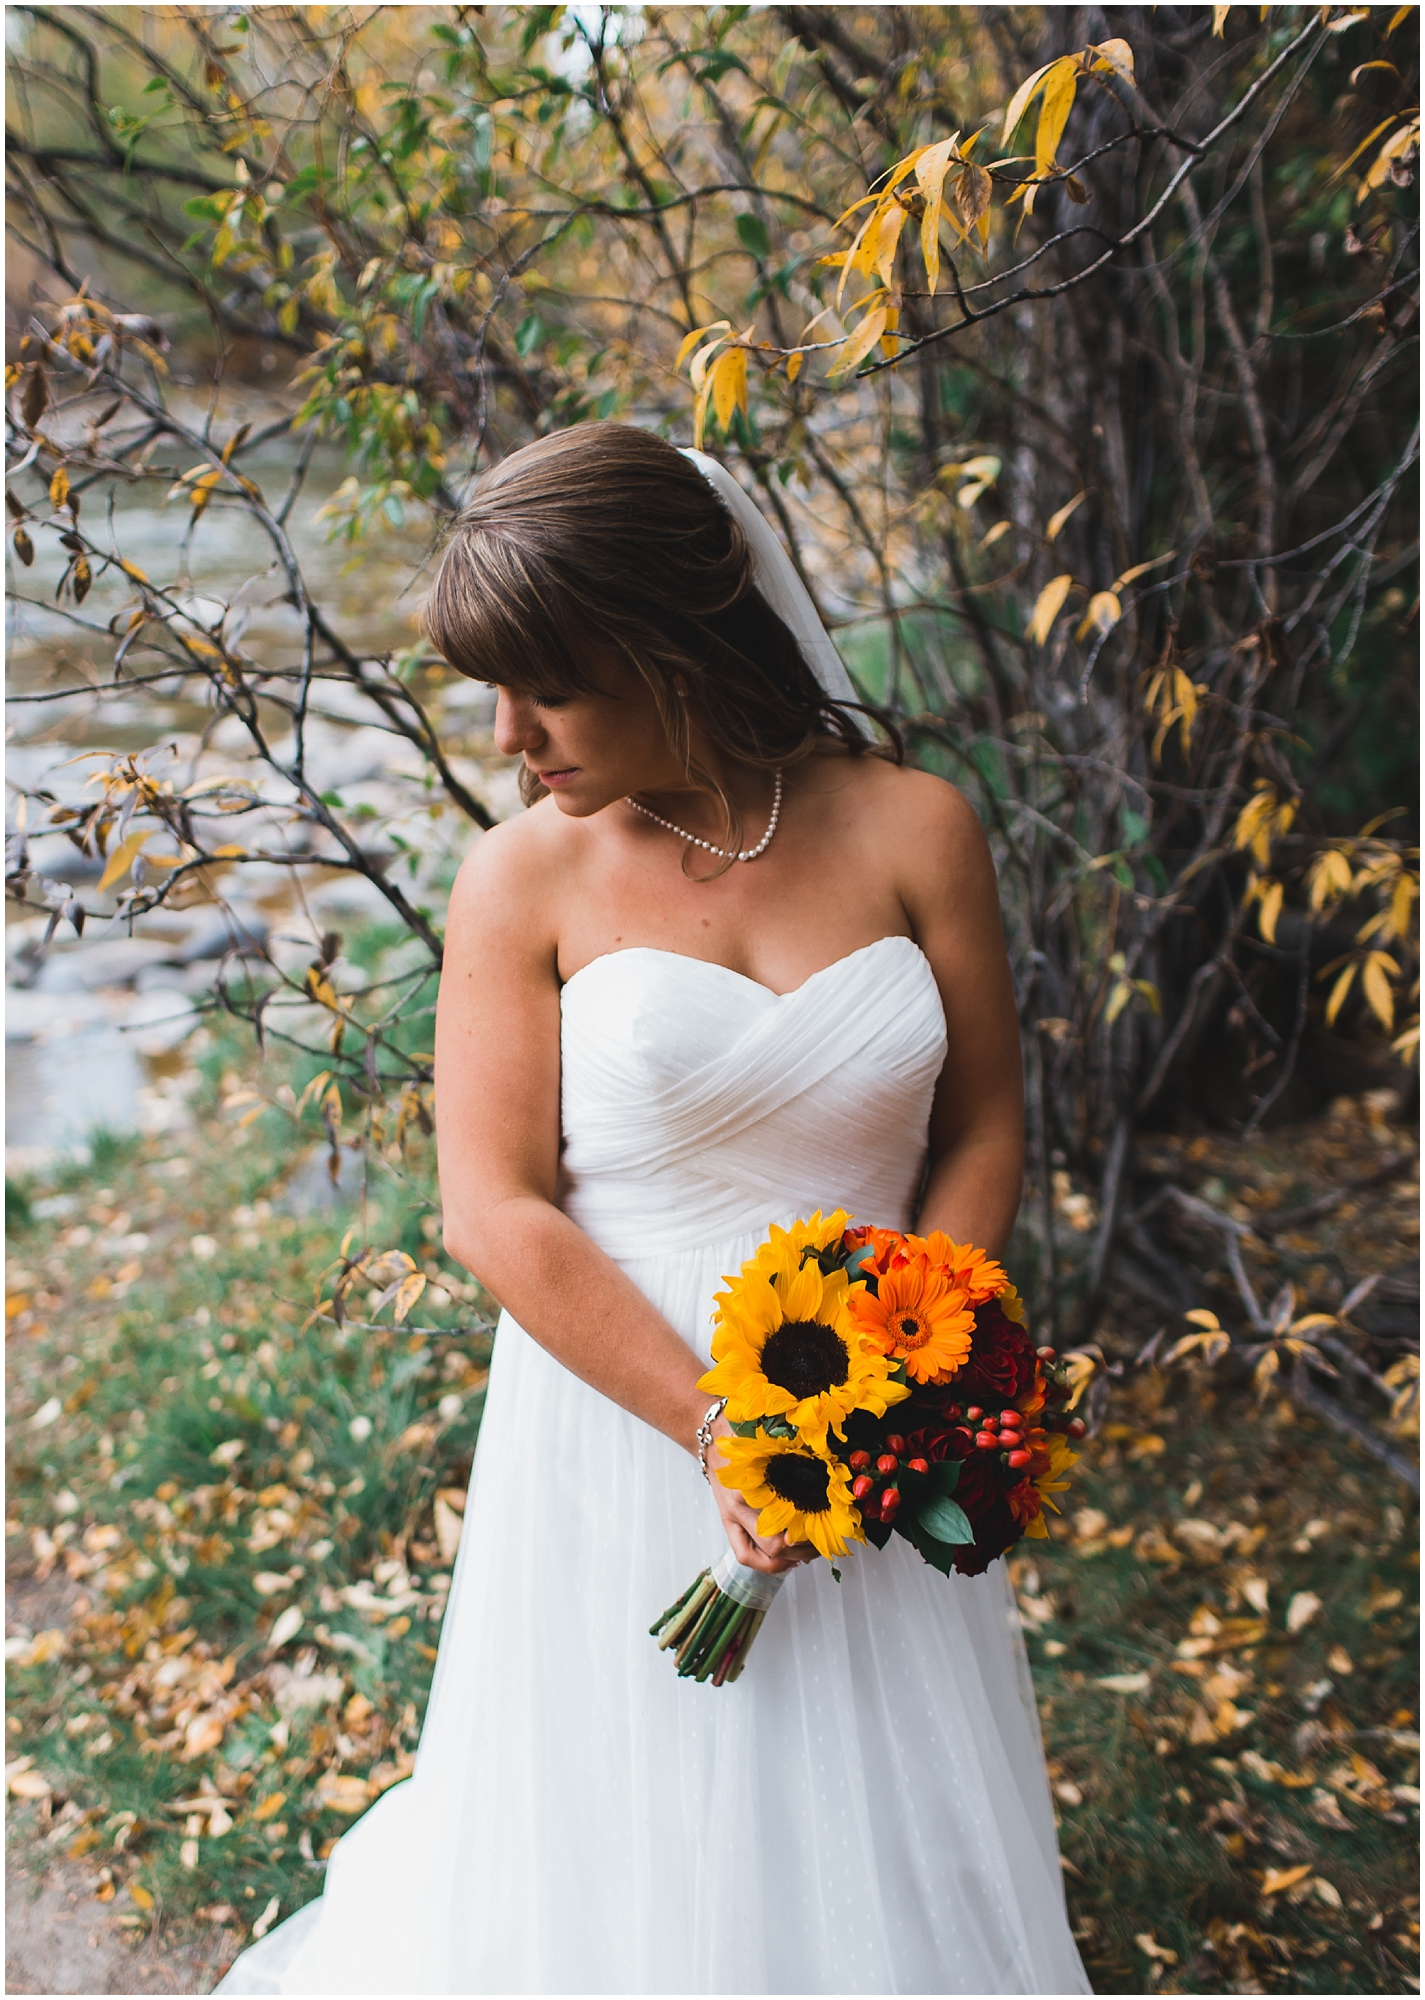 ©Taylor Powers_Shanna+Chris_Wedding_117-1.jpg